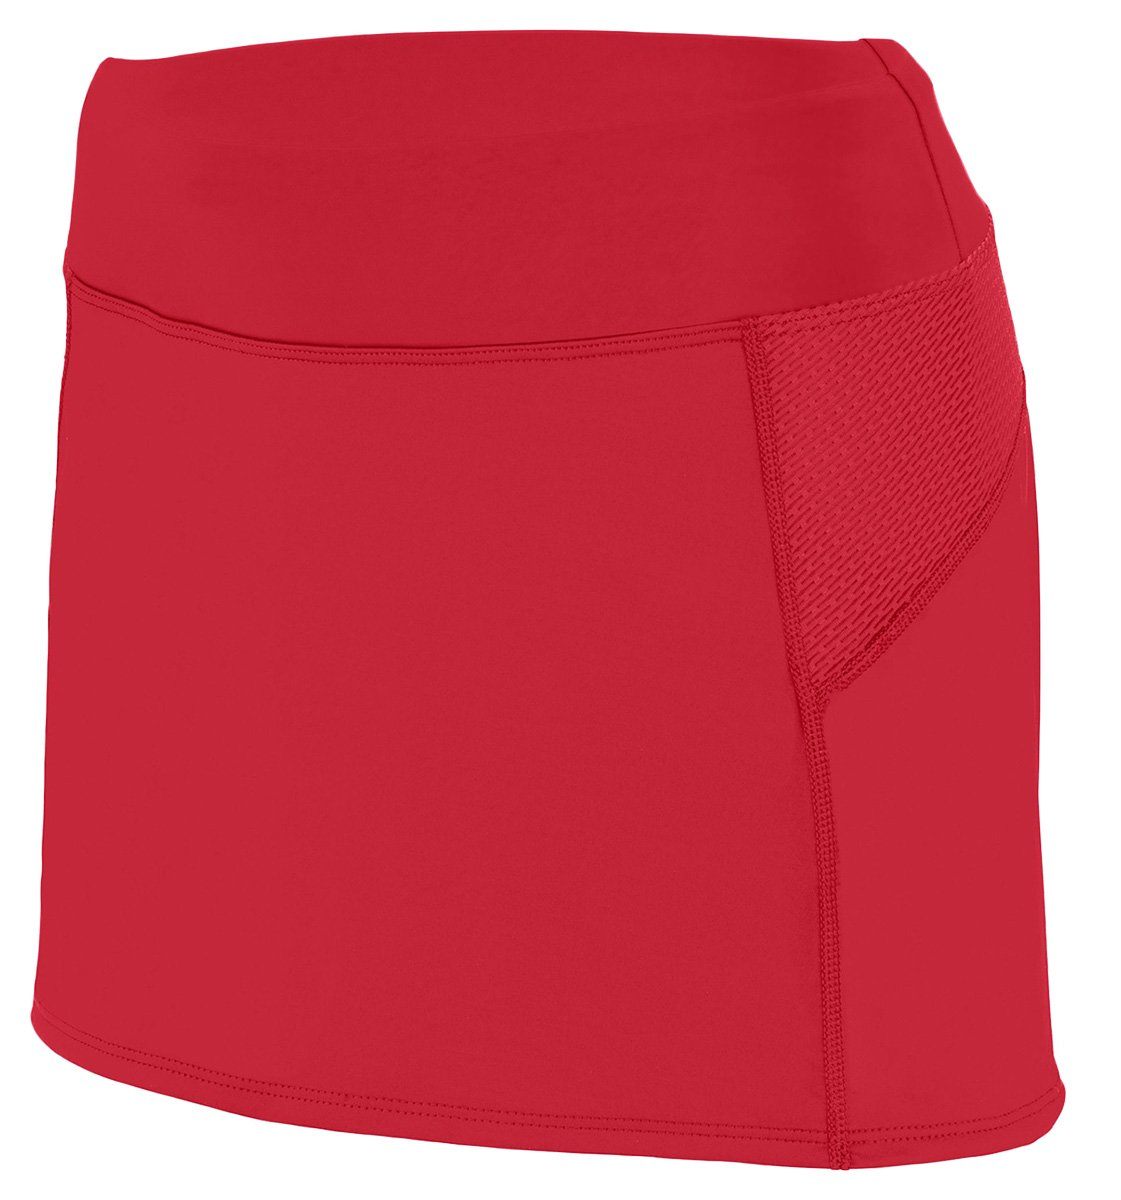 Augusta Sportswear Women's Wide Flat Knit Skort, Red/Graphite, X-Small